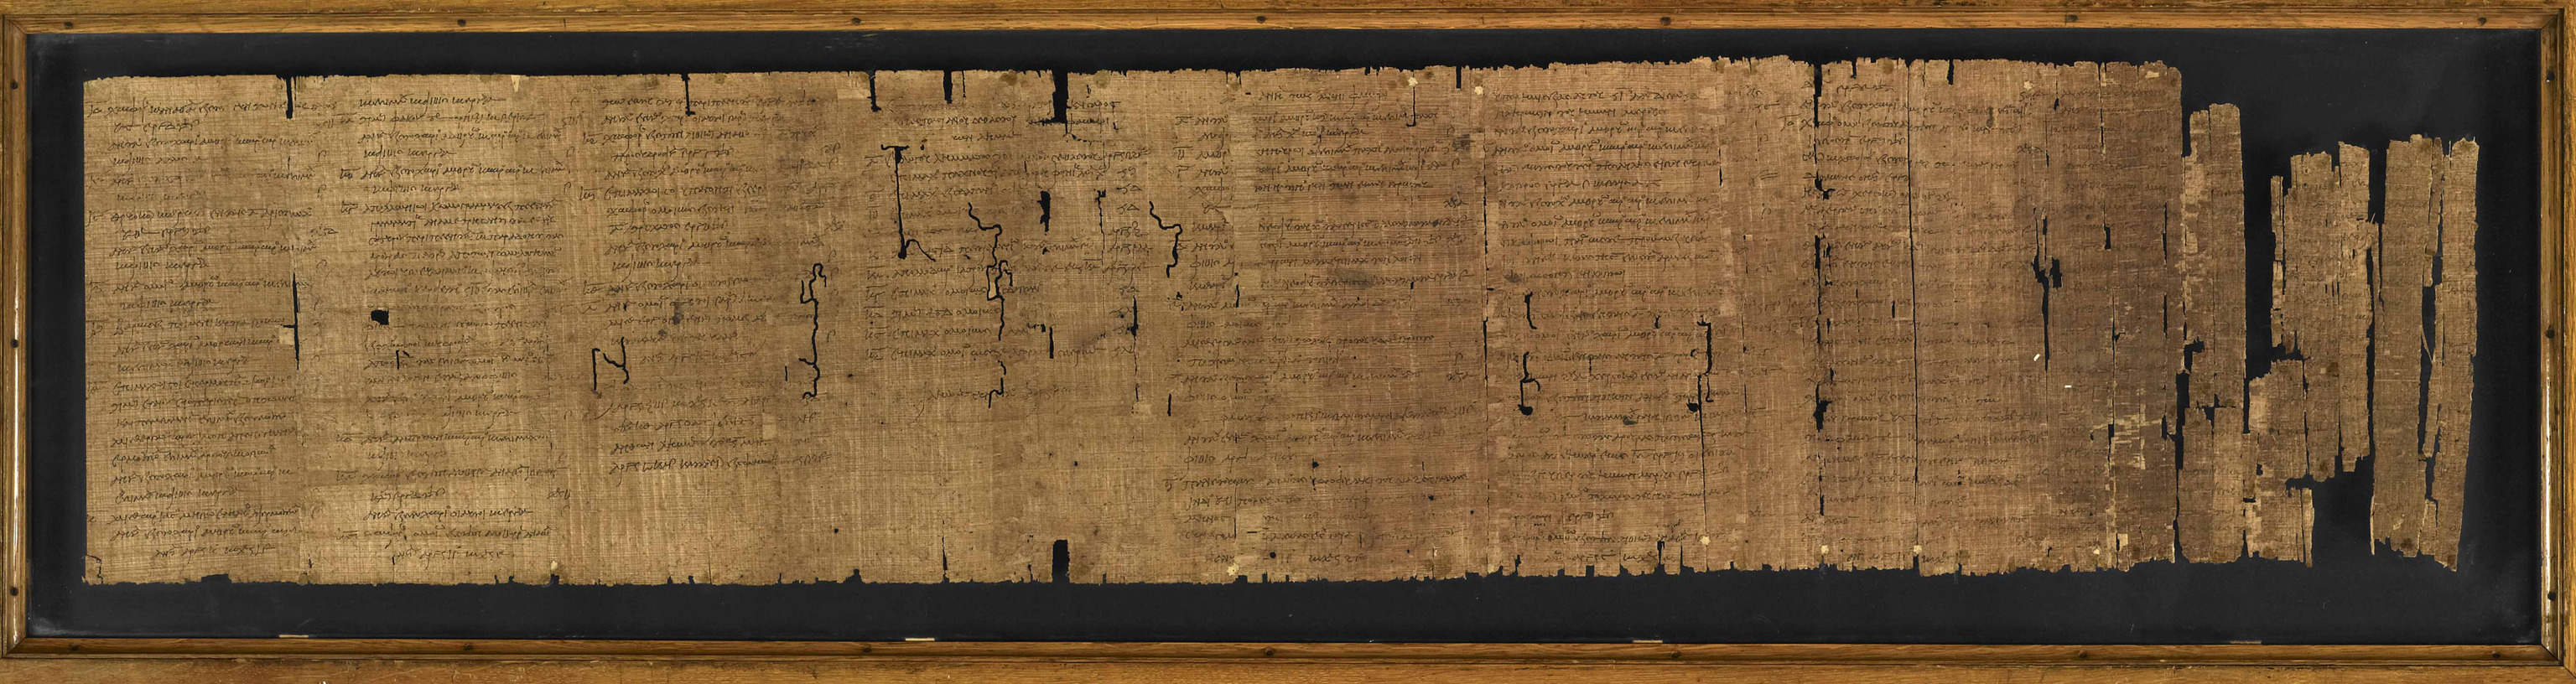 constitution_of_athens_2878-c-10029_-_bl_papyrus_131